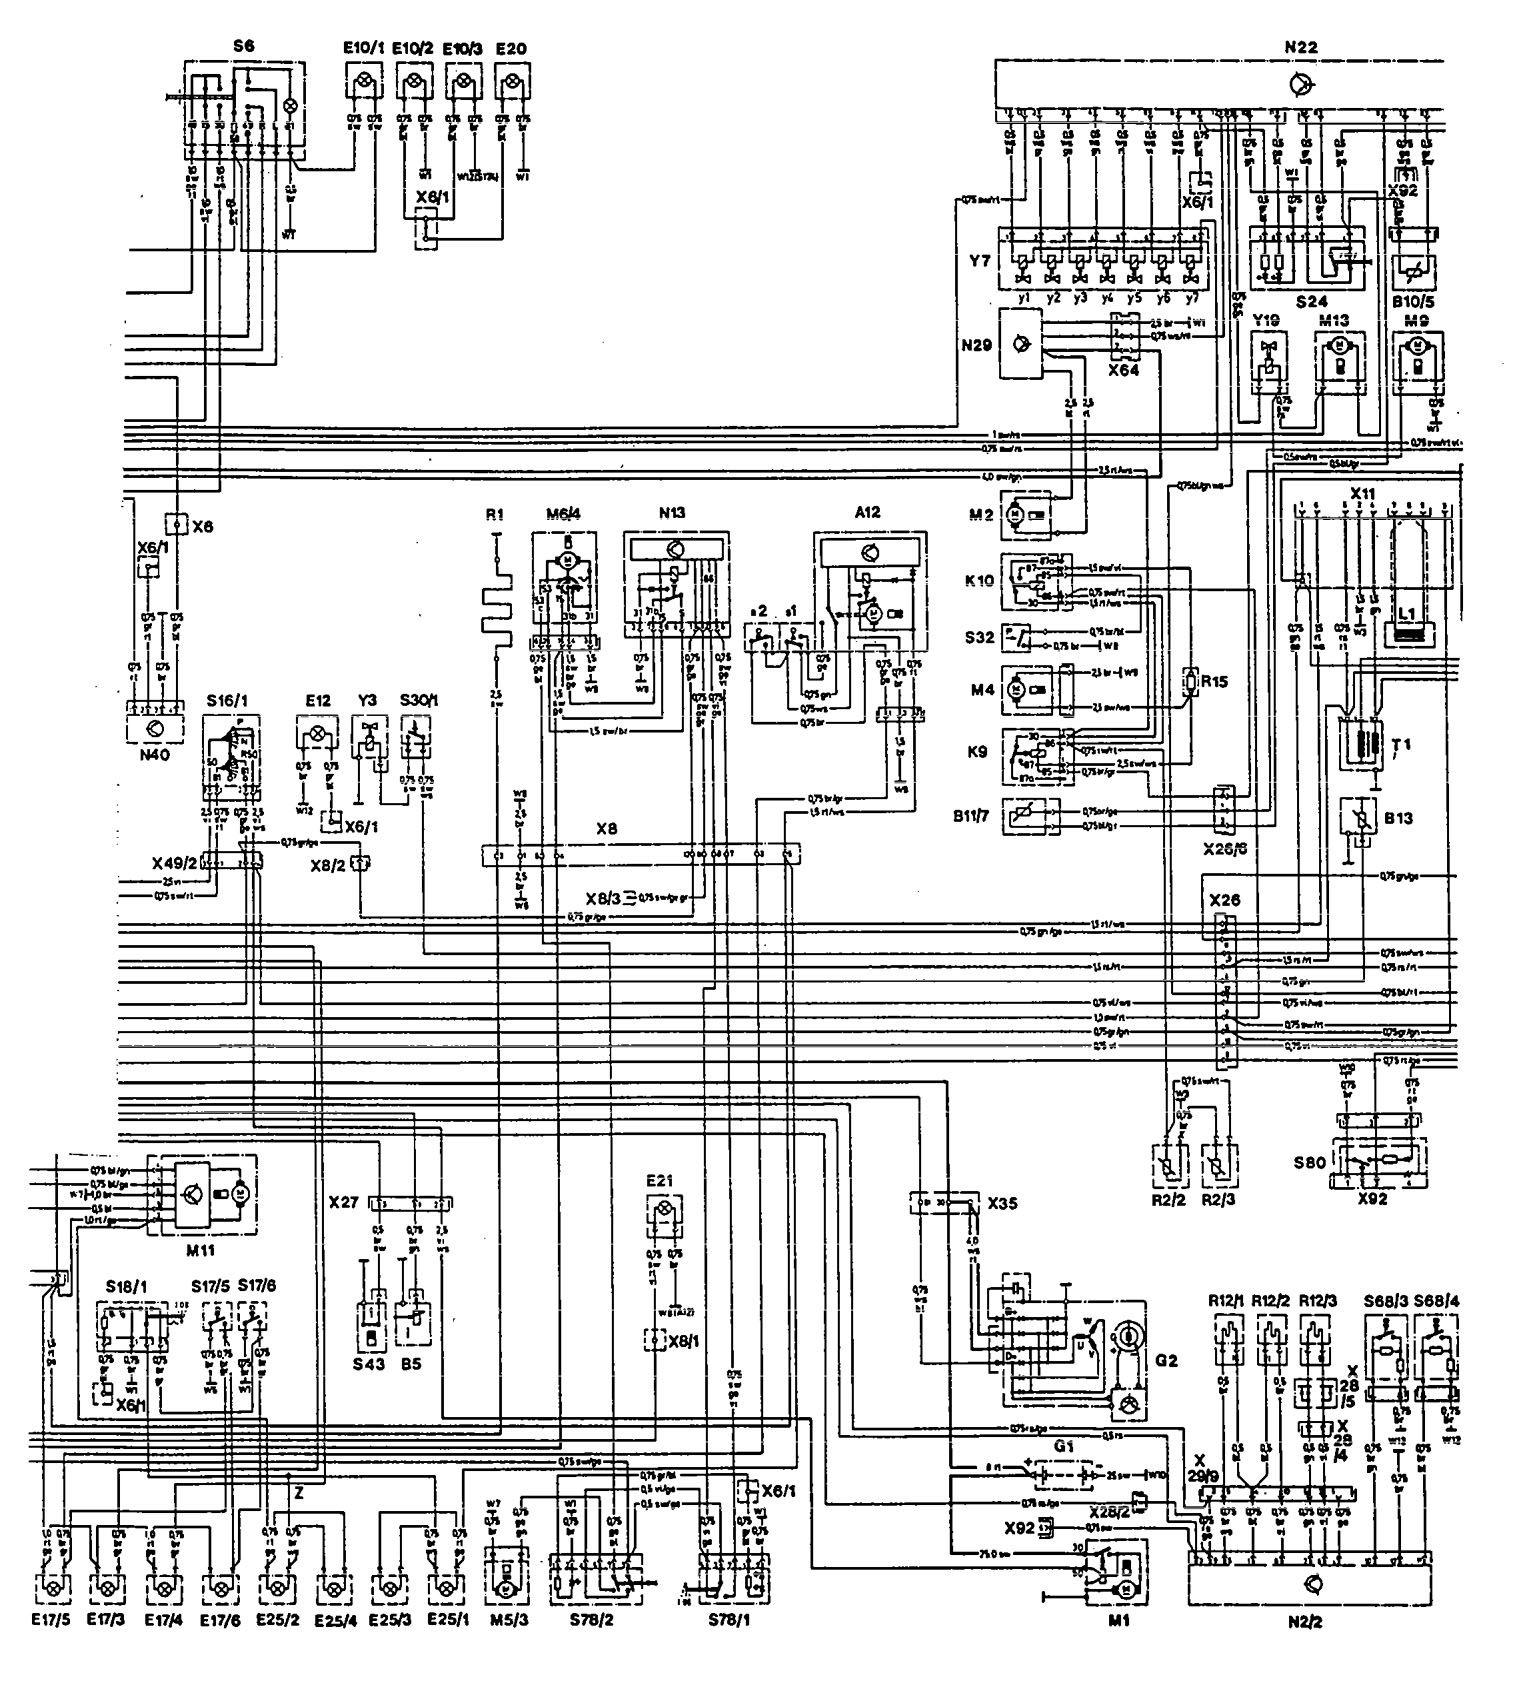 Mercedes Benz 300te 1992 1993 Wiring Diagrams Cooling Fans Fan Diagram Part 2